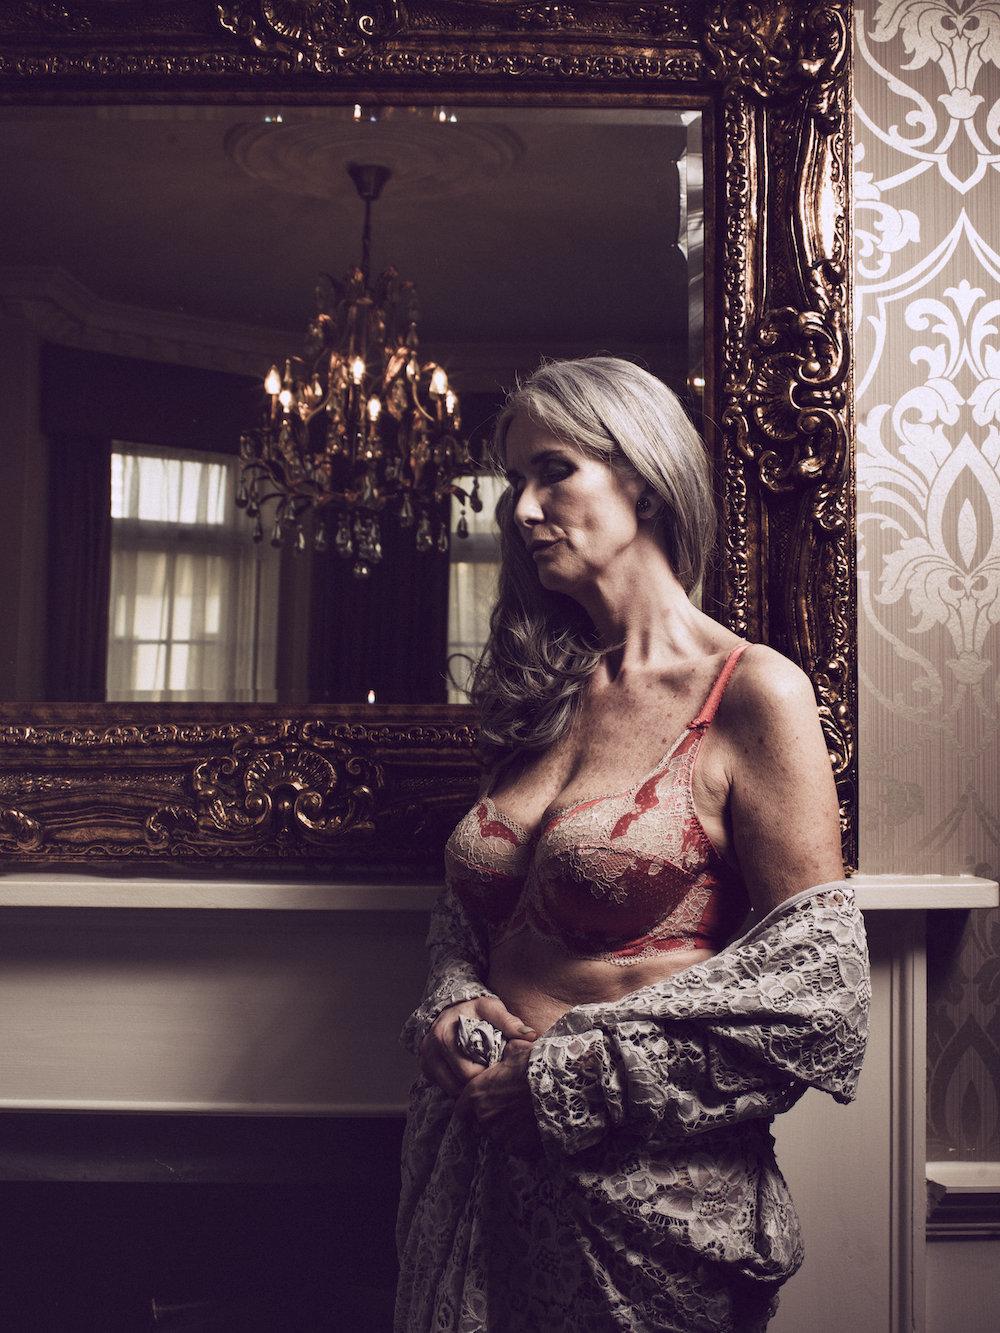 Sexy older women lingerie